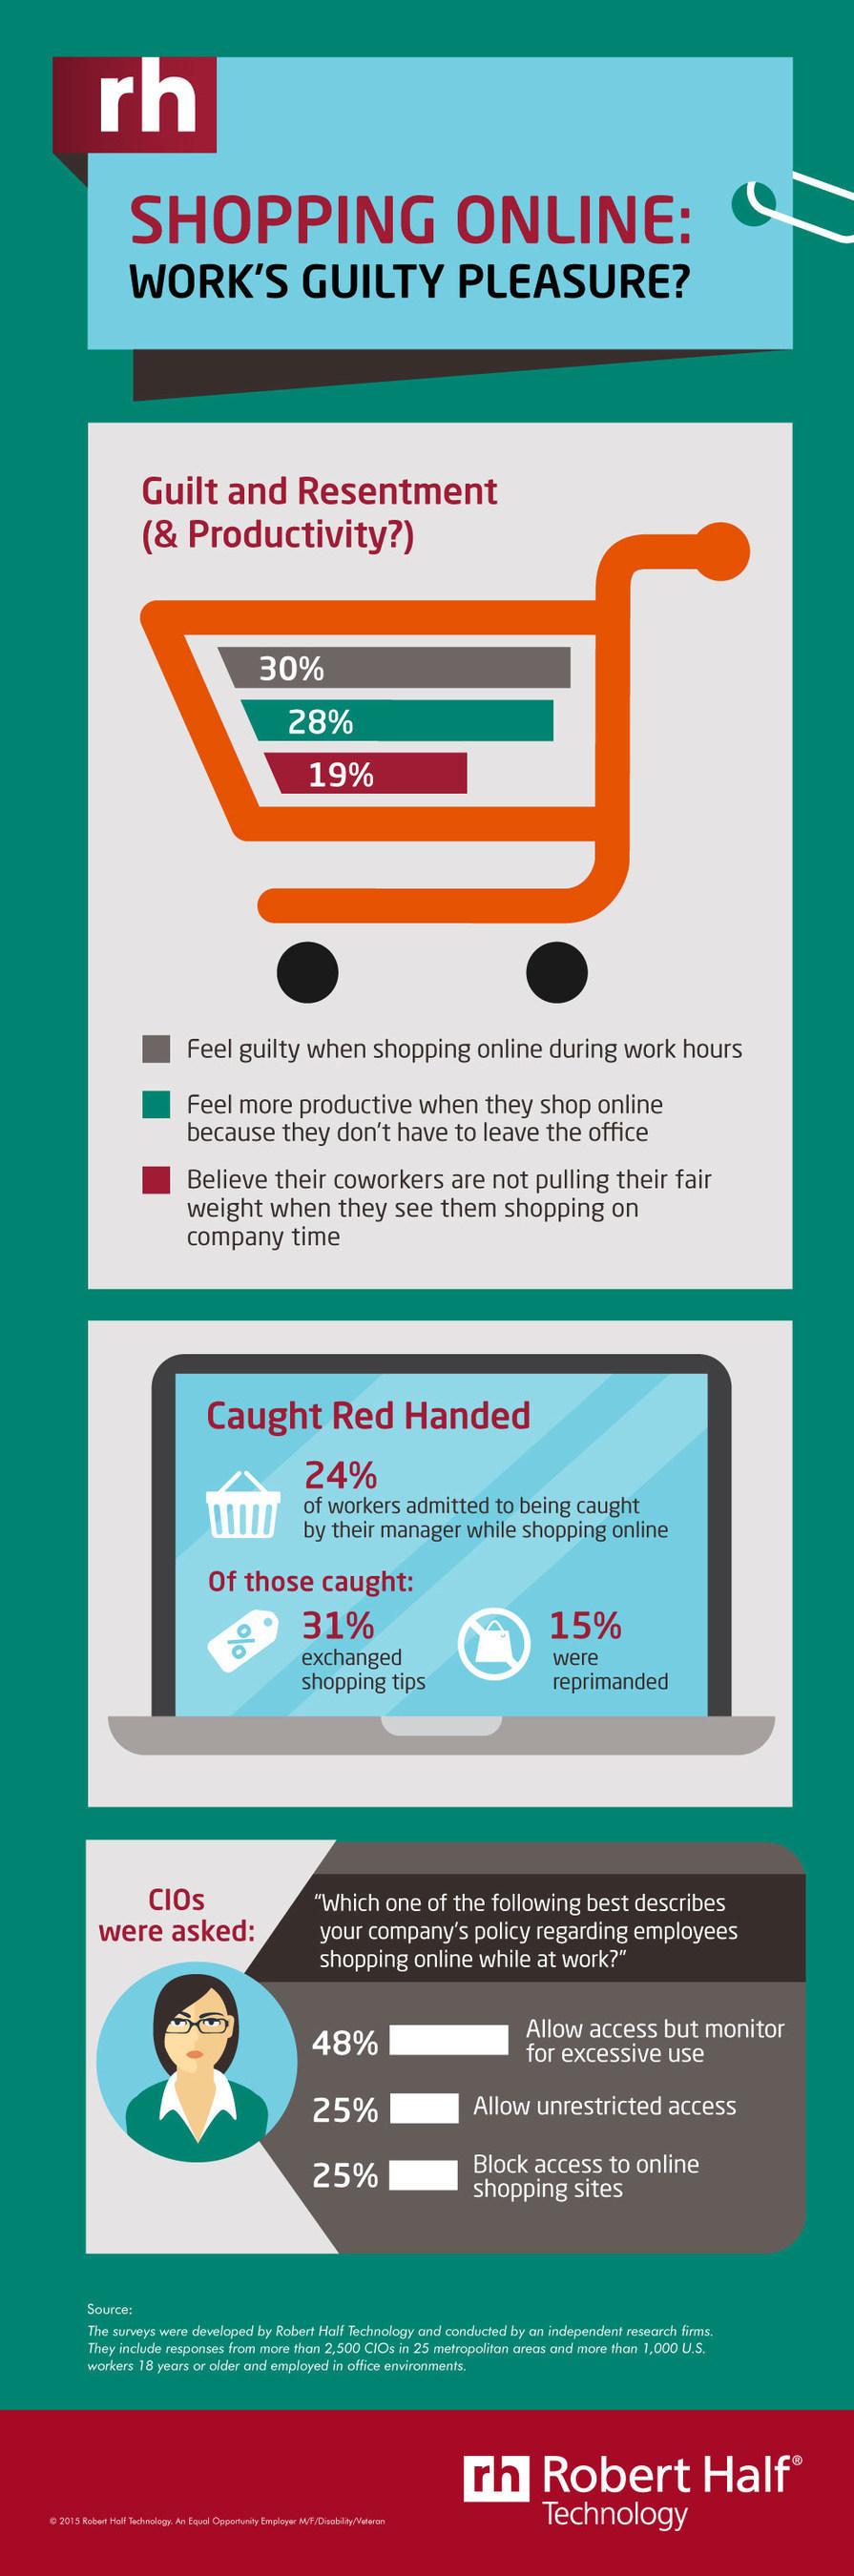 Shopping Online: Work's Guilty Pleasure?